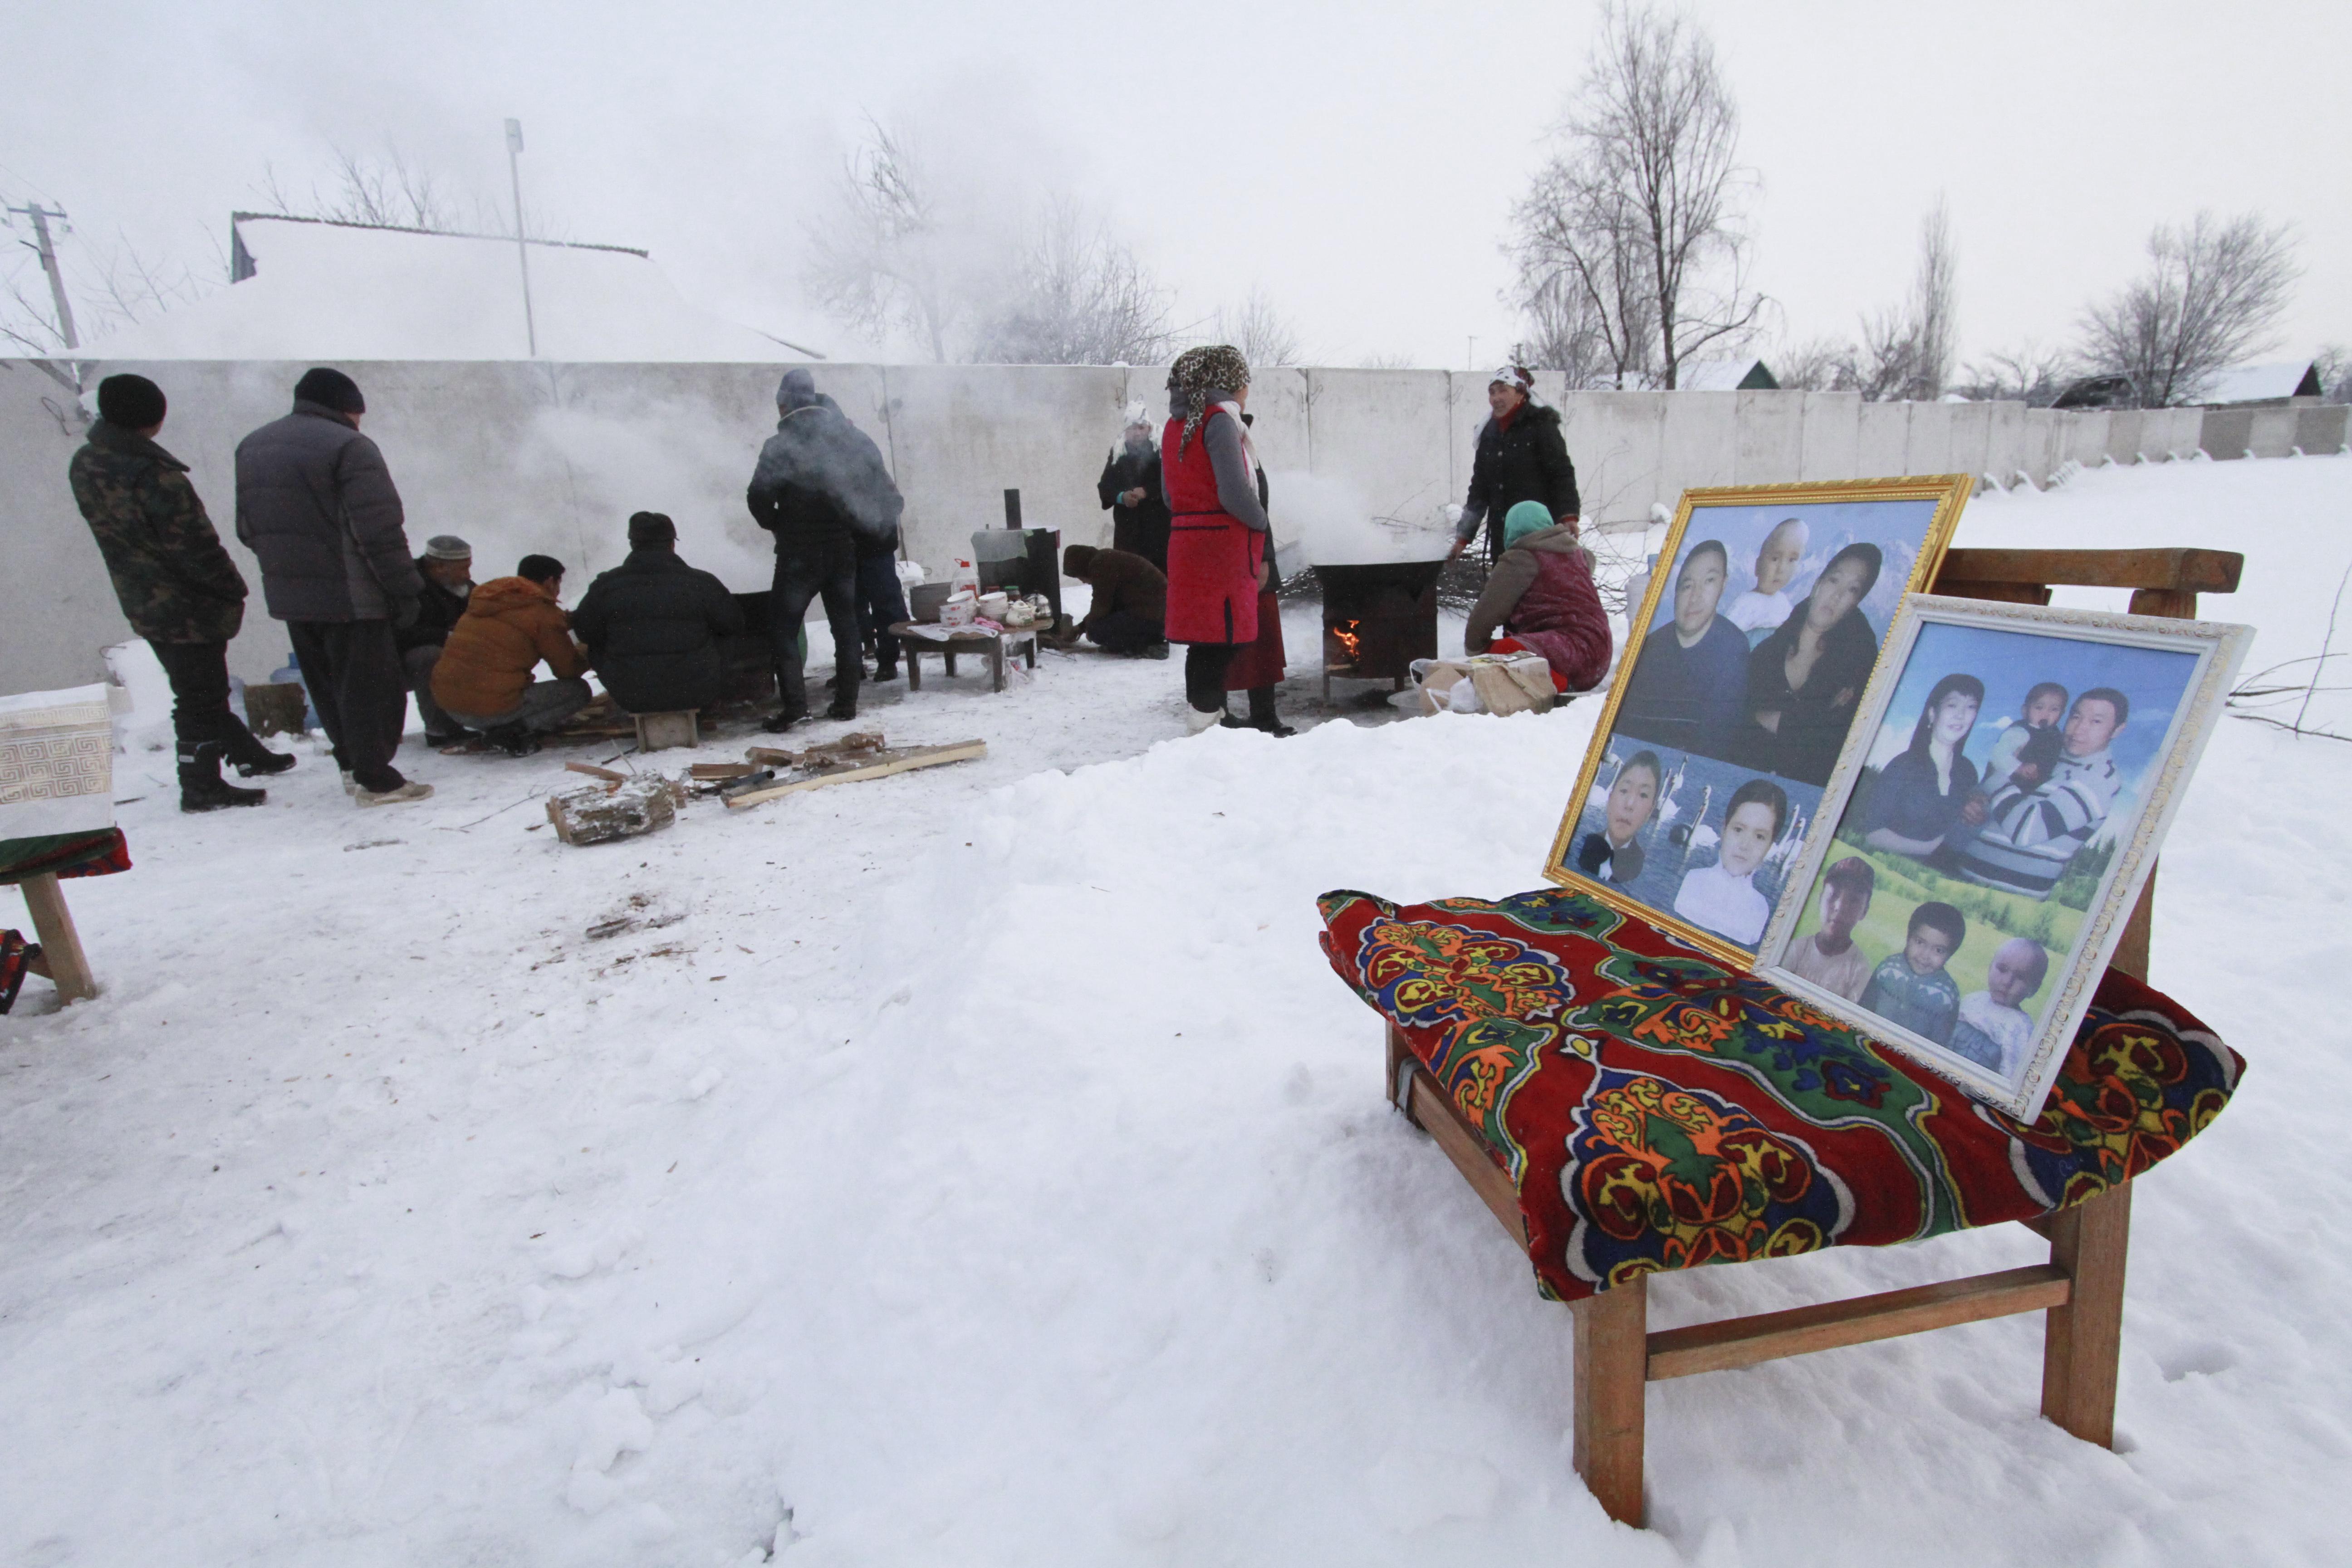 صور ضحايا تحطم طائرة فى قرغيزستان